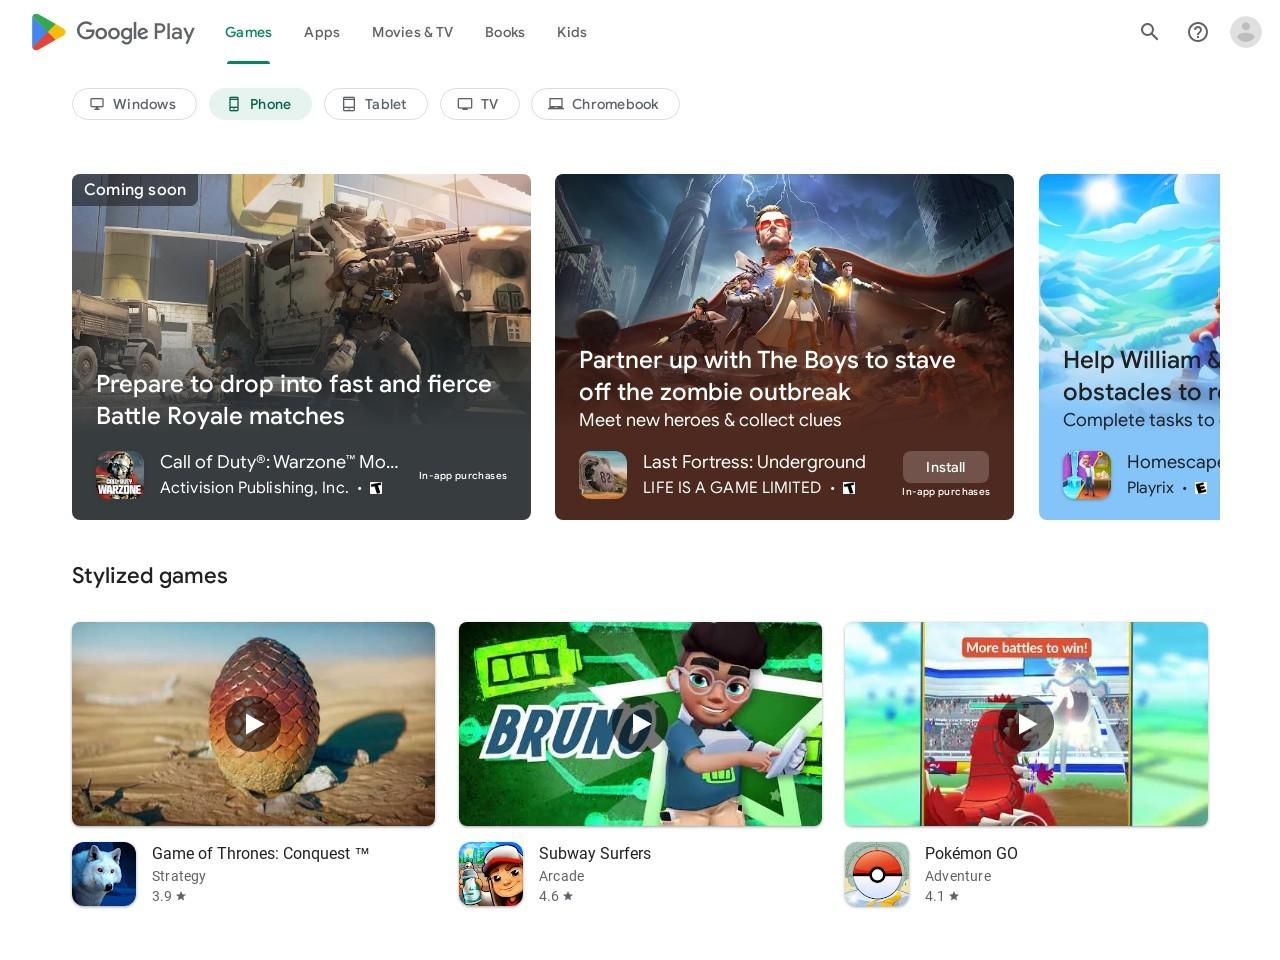 https://play.google.com/store/apps/details?id=slade.android.startrek&hl=en